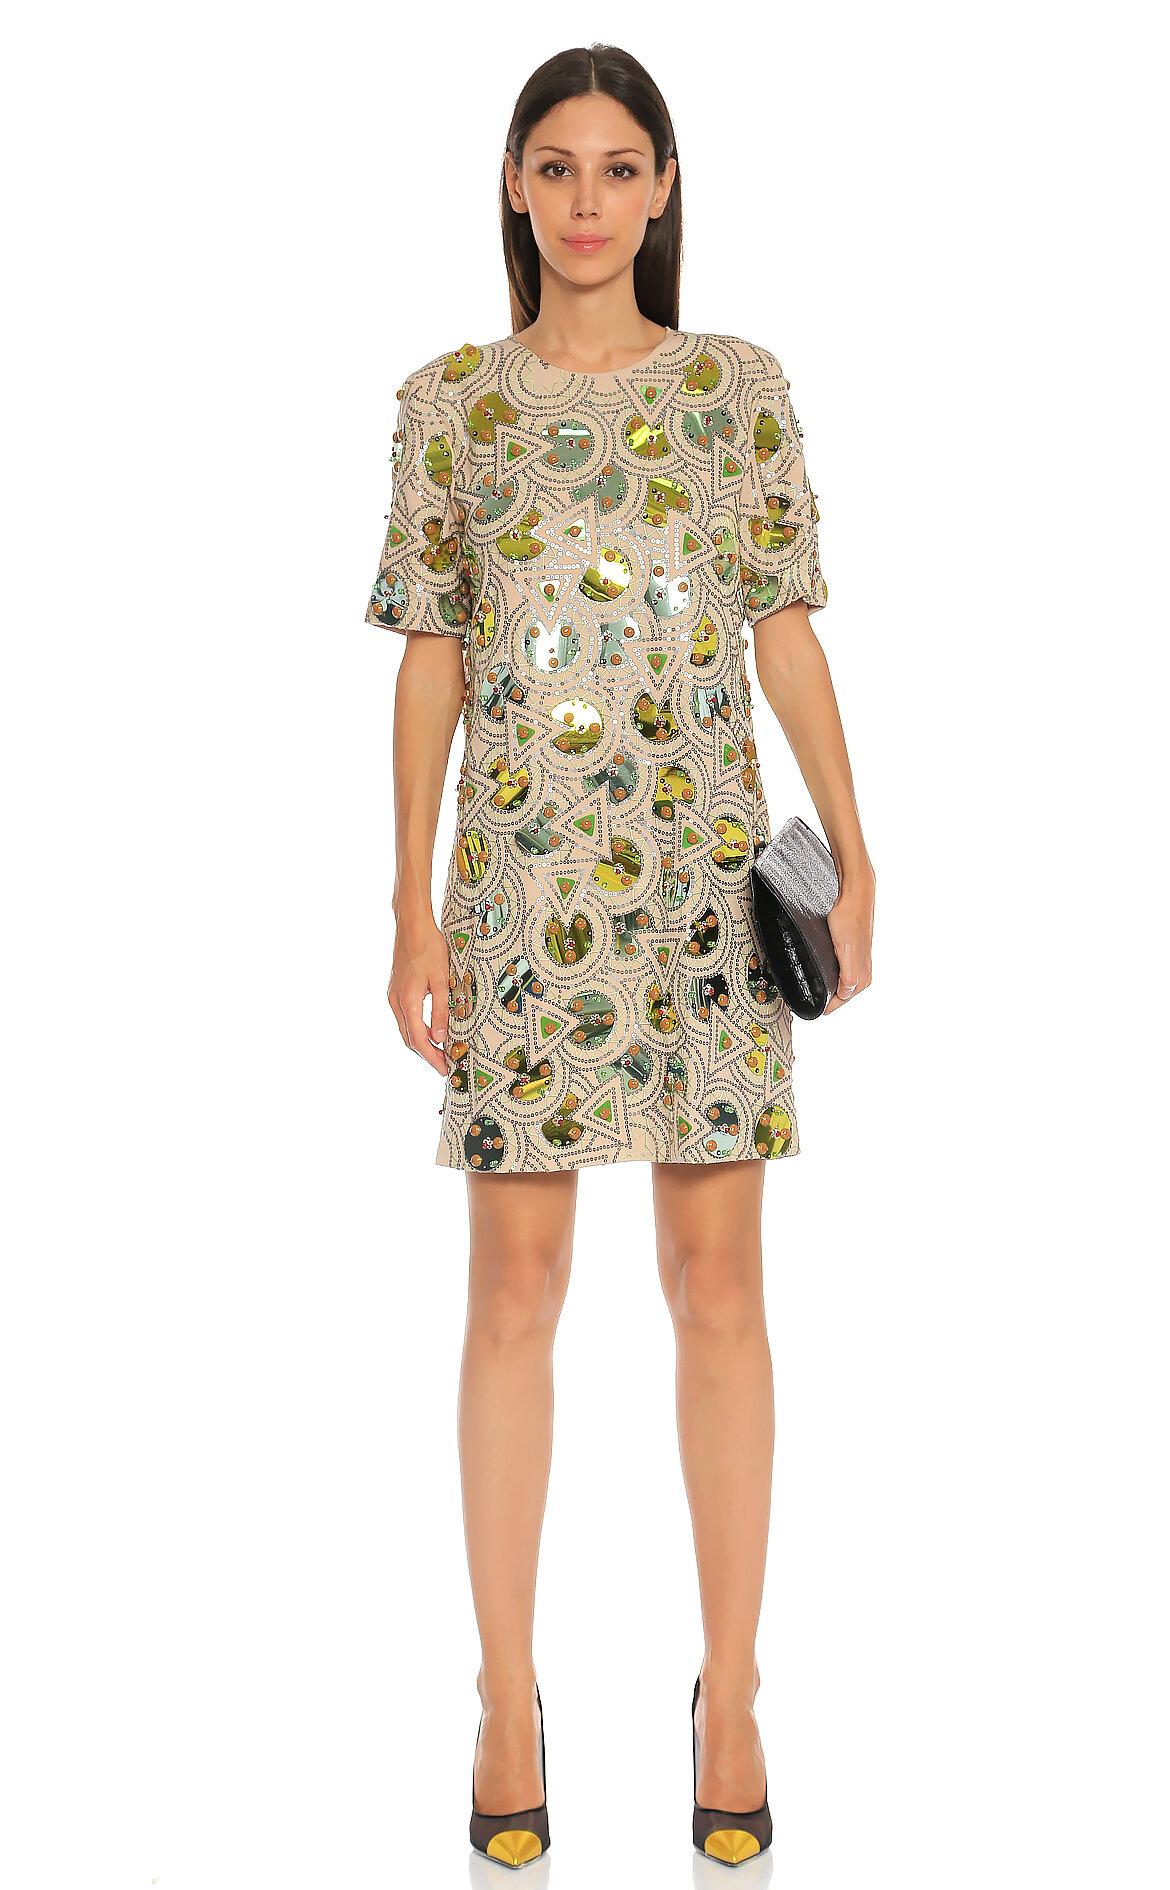 771cb14677d29 DKNY Kadın Pudra Rengi Elbise DKNYP157703MB-PALEPOWDER - Brandroom